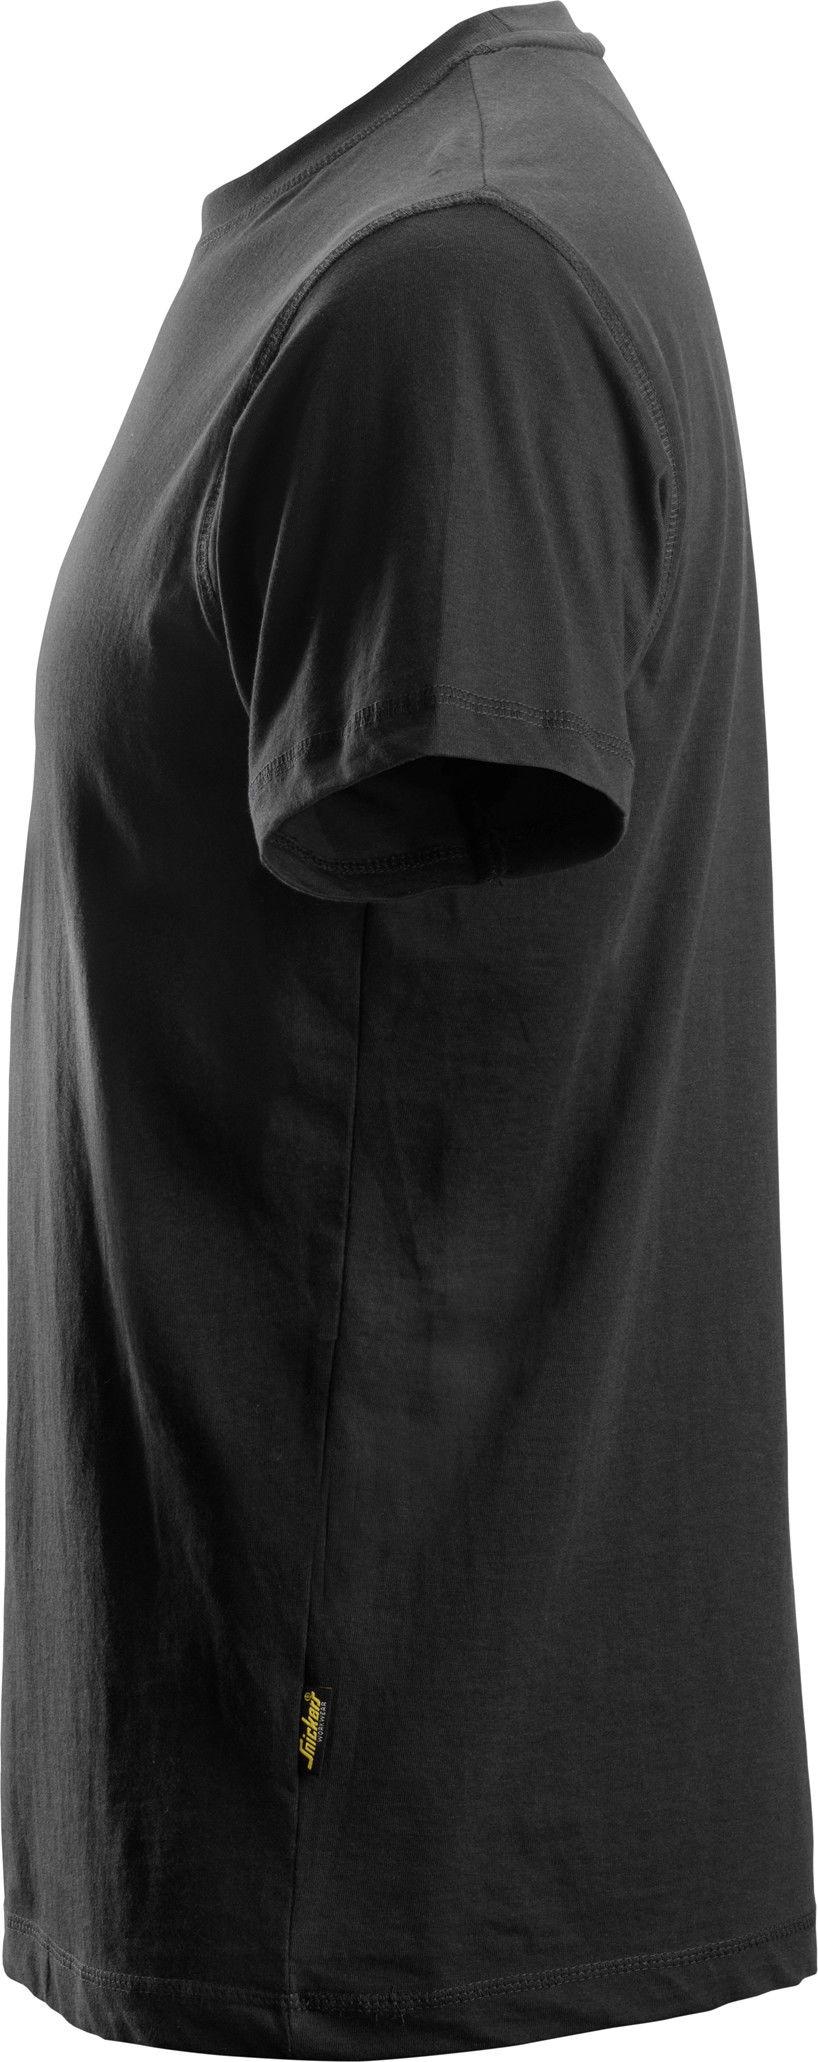 T-shirt koszulka męska, czarna, rozmiar XXXL, 2502 Snickers [25020400009]